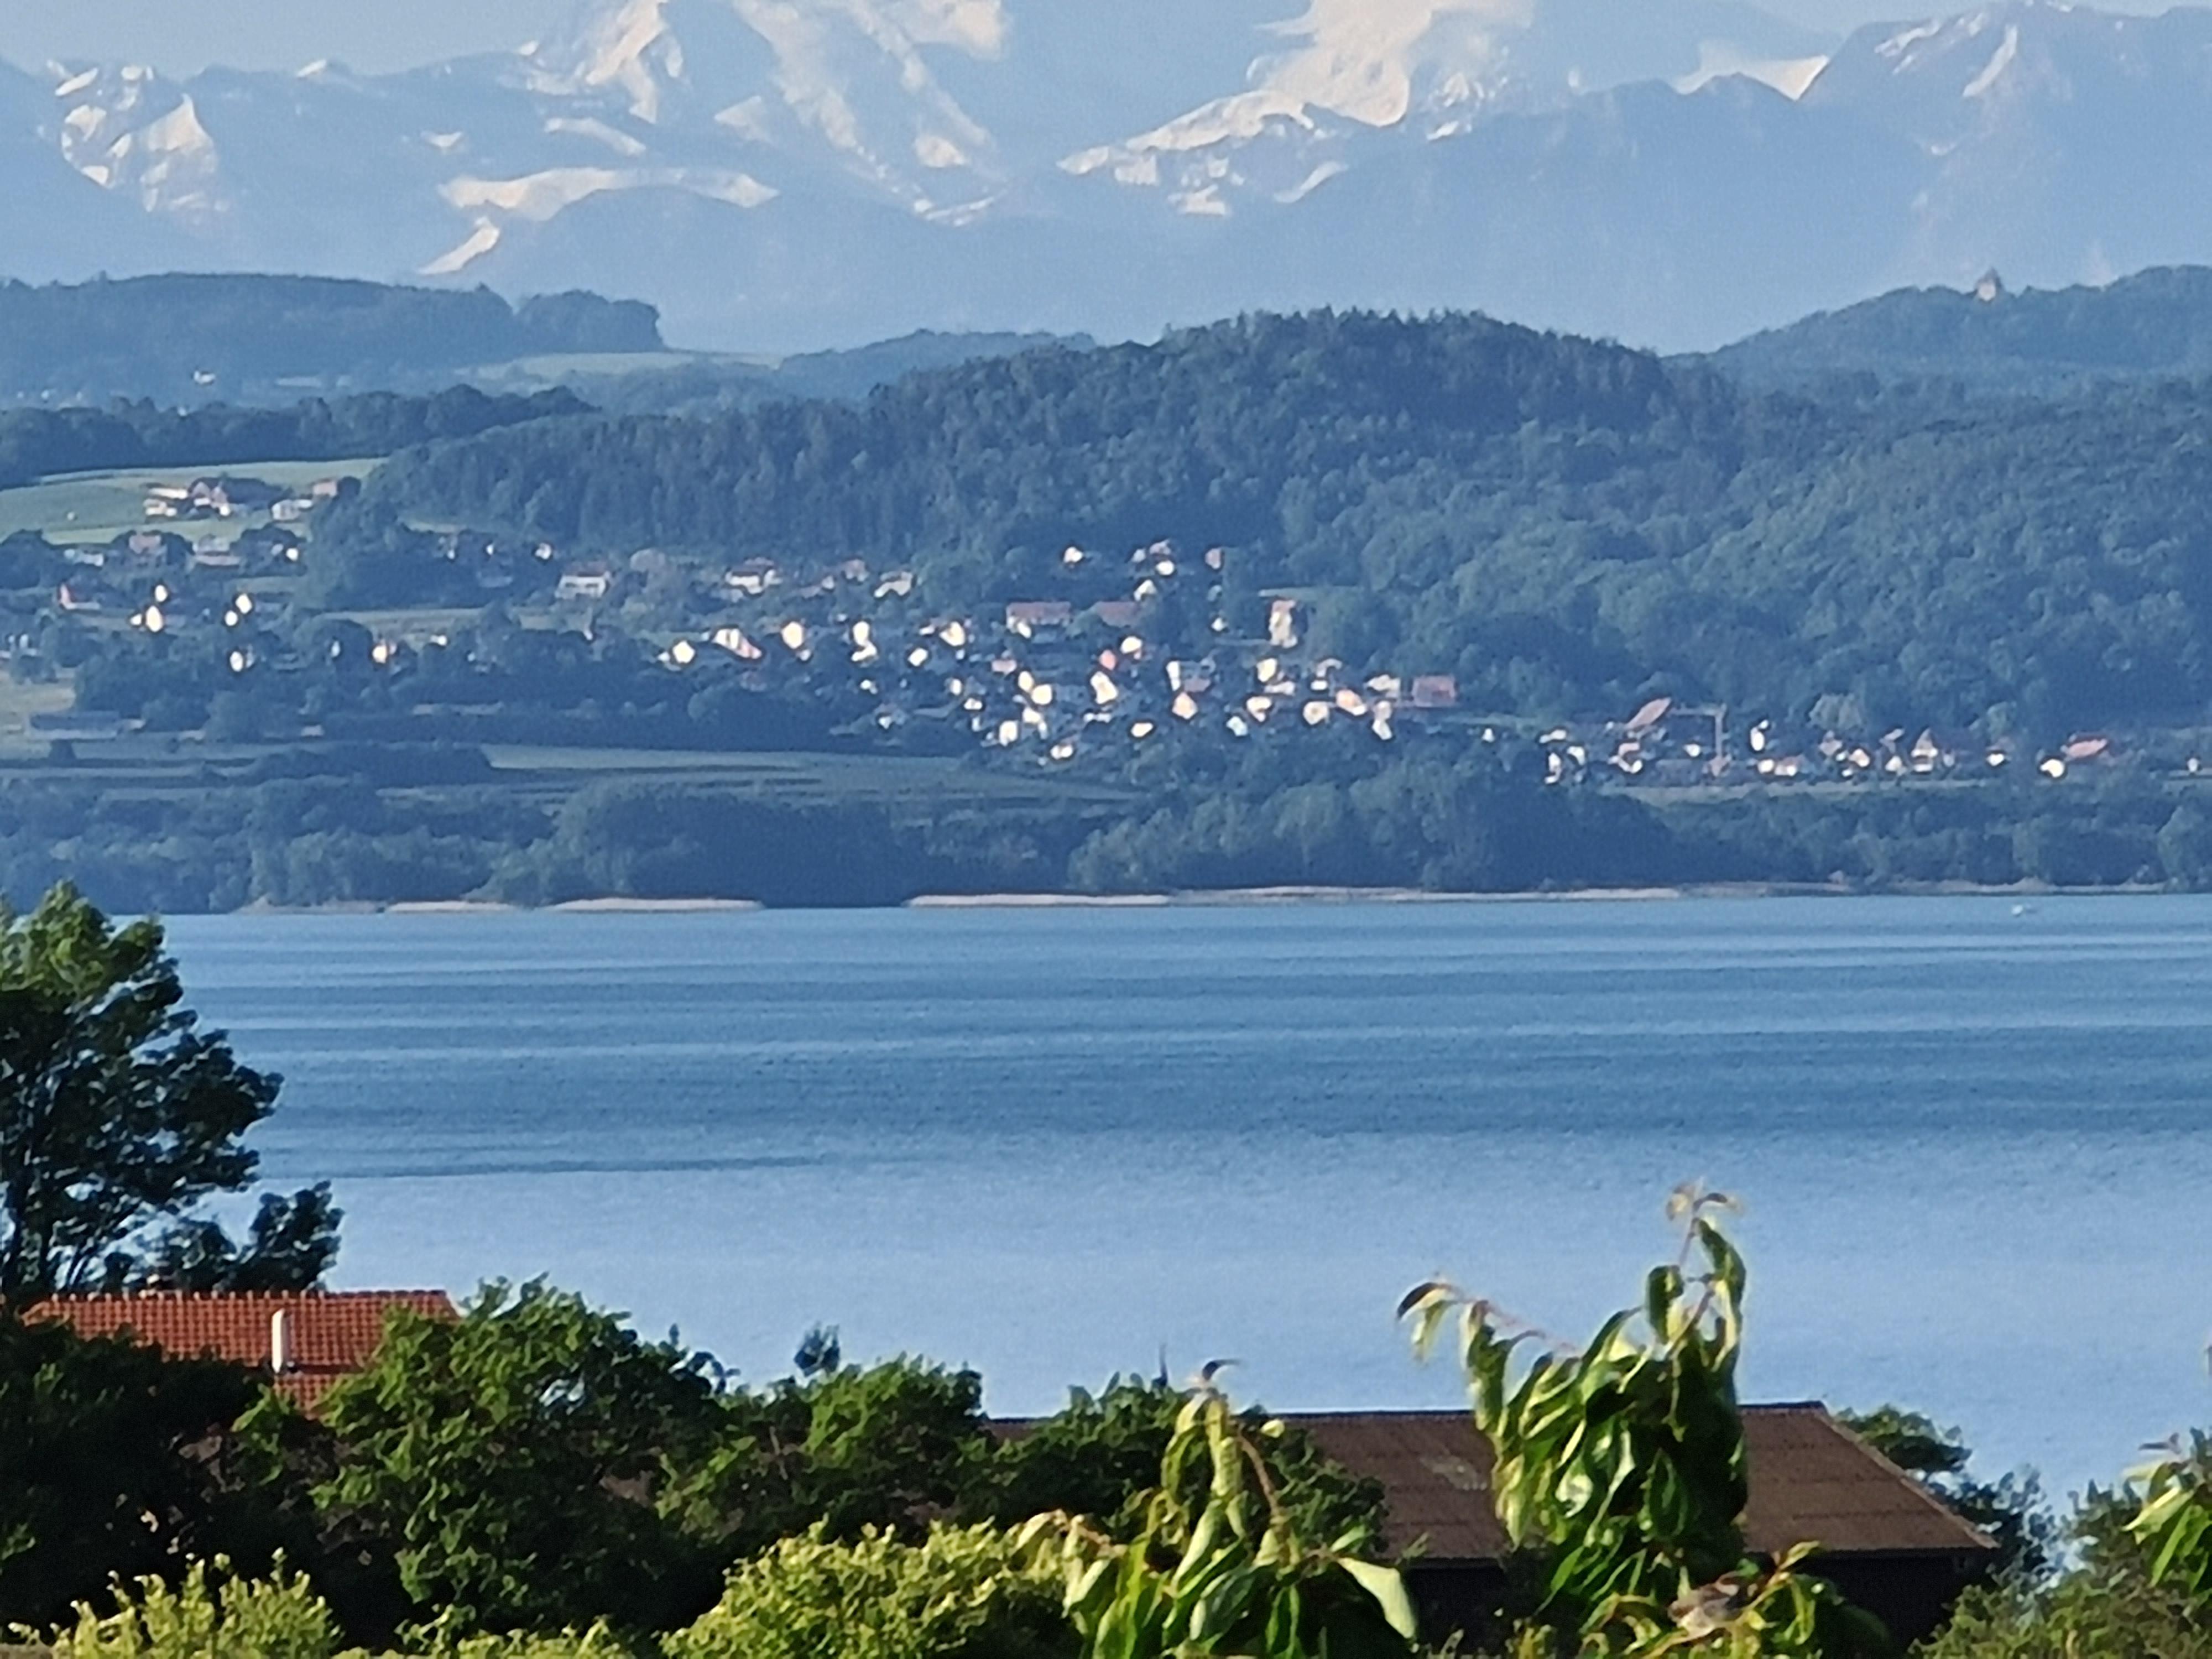 Appartement de vacances bei moumie studio ruhiger platz parkplatz und jacuzzi und pool (2598219), Bevaix, Lac de Neuchâtel, Jura - Neuchâtel, Suisse, image 25